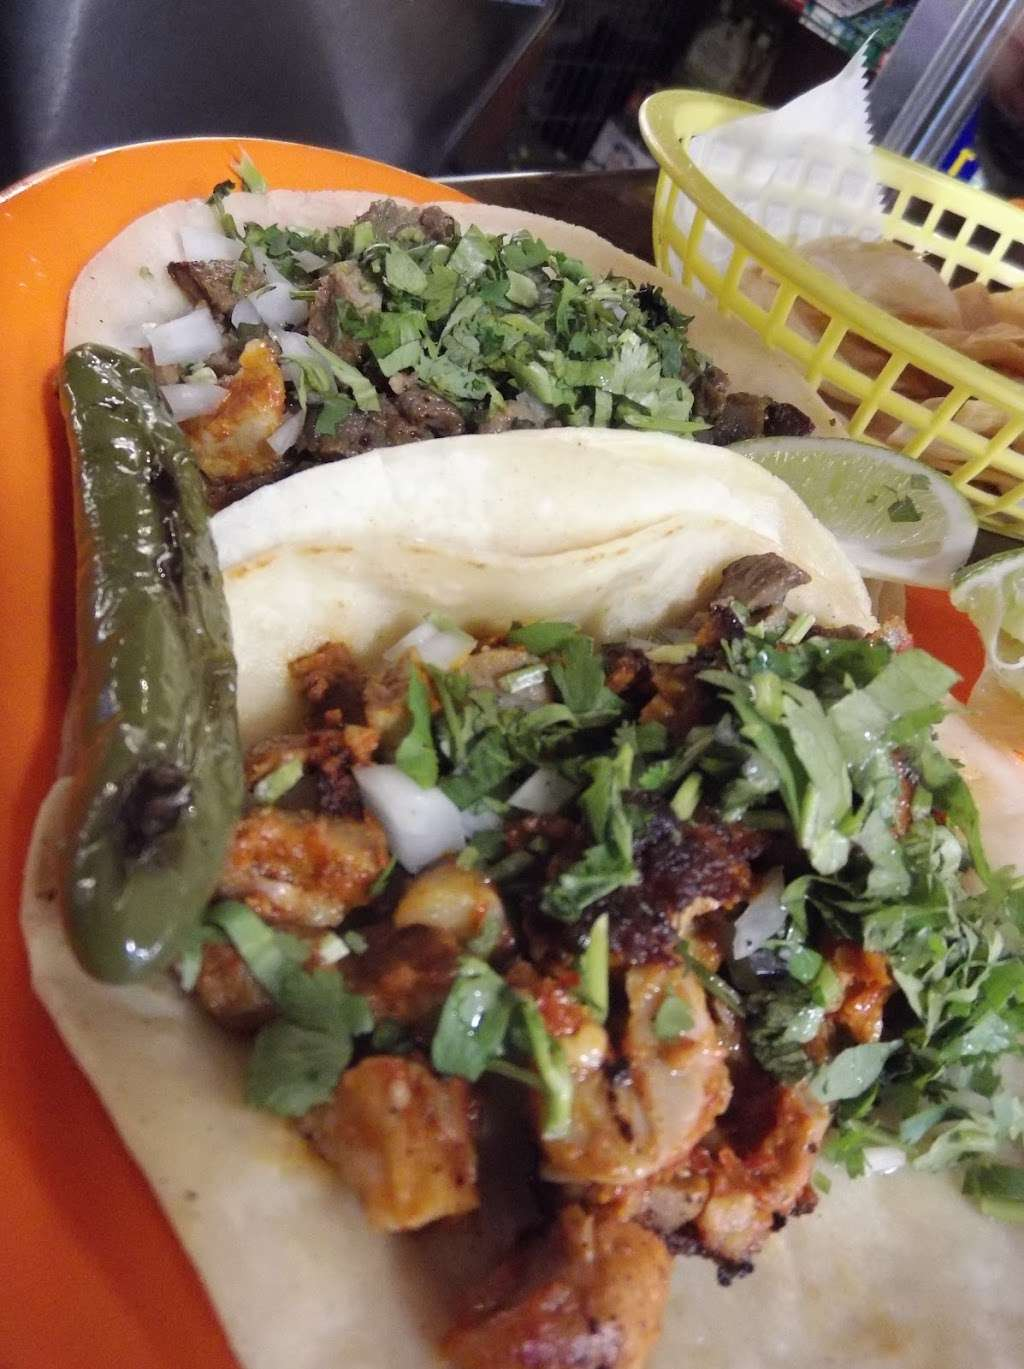 Regalo De Juquila - restaurant  | Photo 6 of 10 | Address: 1209 Myrtle Ave, Brooklyn, NY 11221, USA | Phone: (347) 240-7111